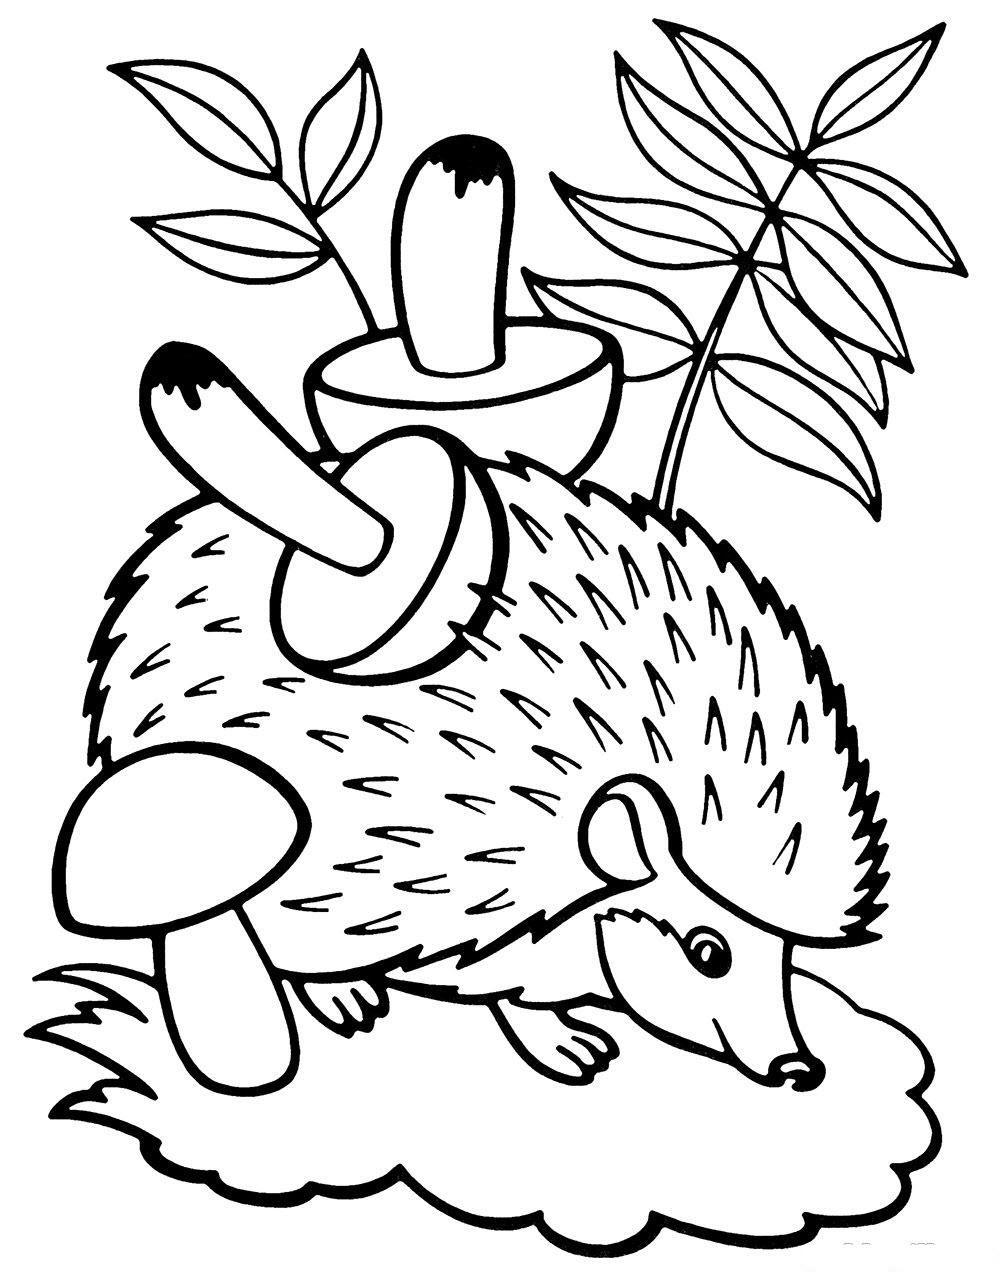 кто картинки раскраски зайчика и ежика среднеранний сорт средней